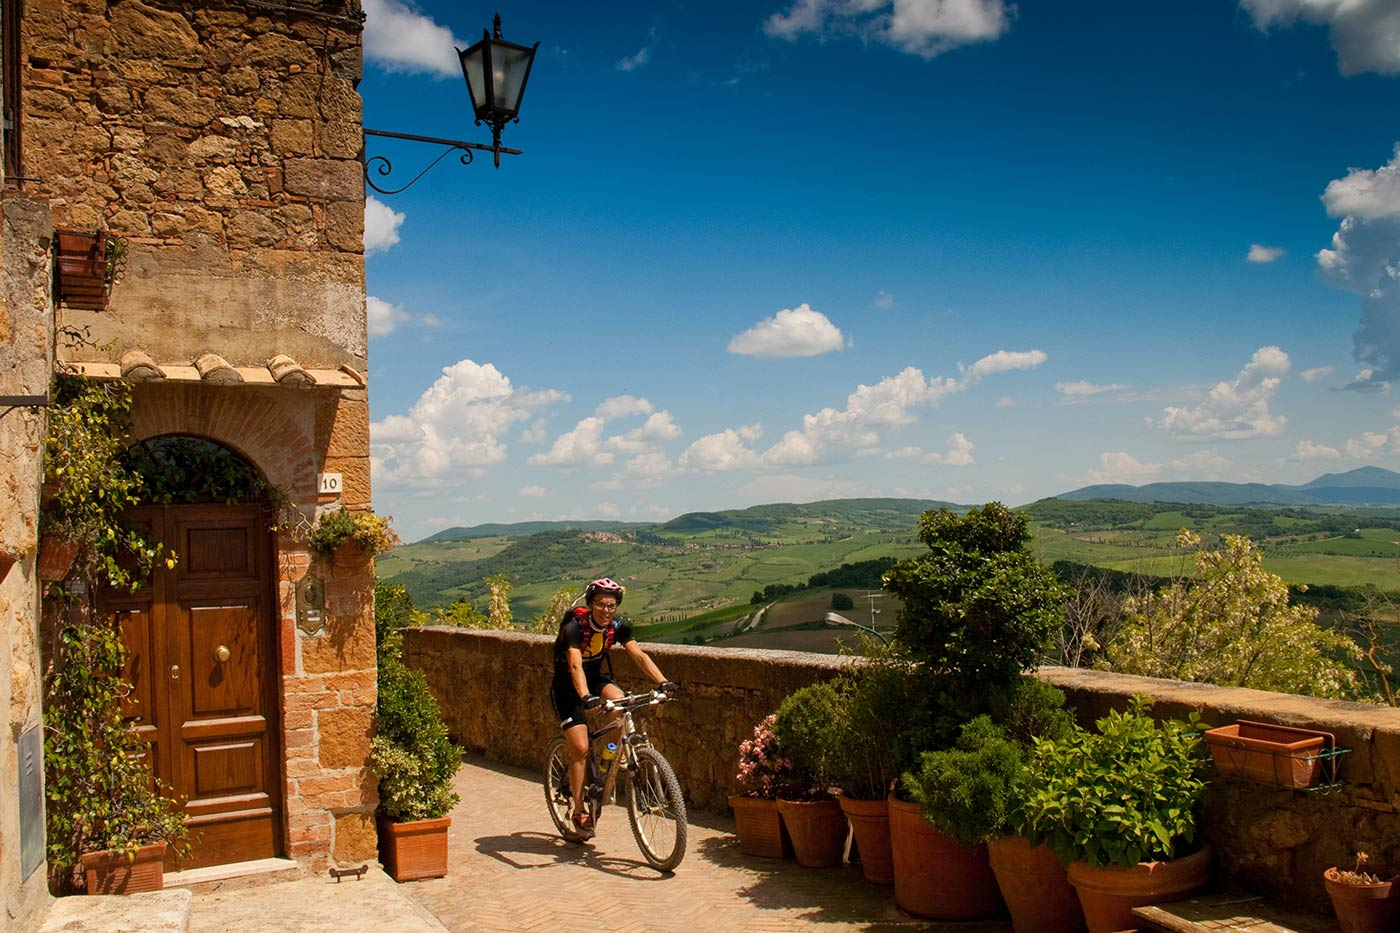 Viaggiare in bici in Toscana